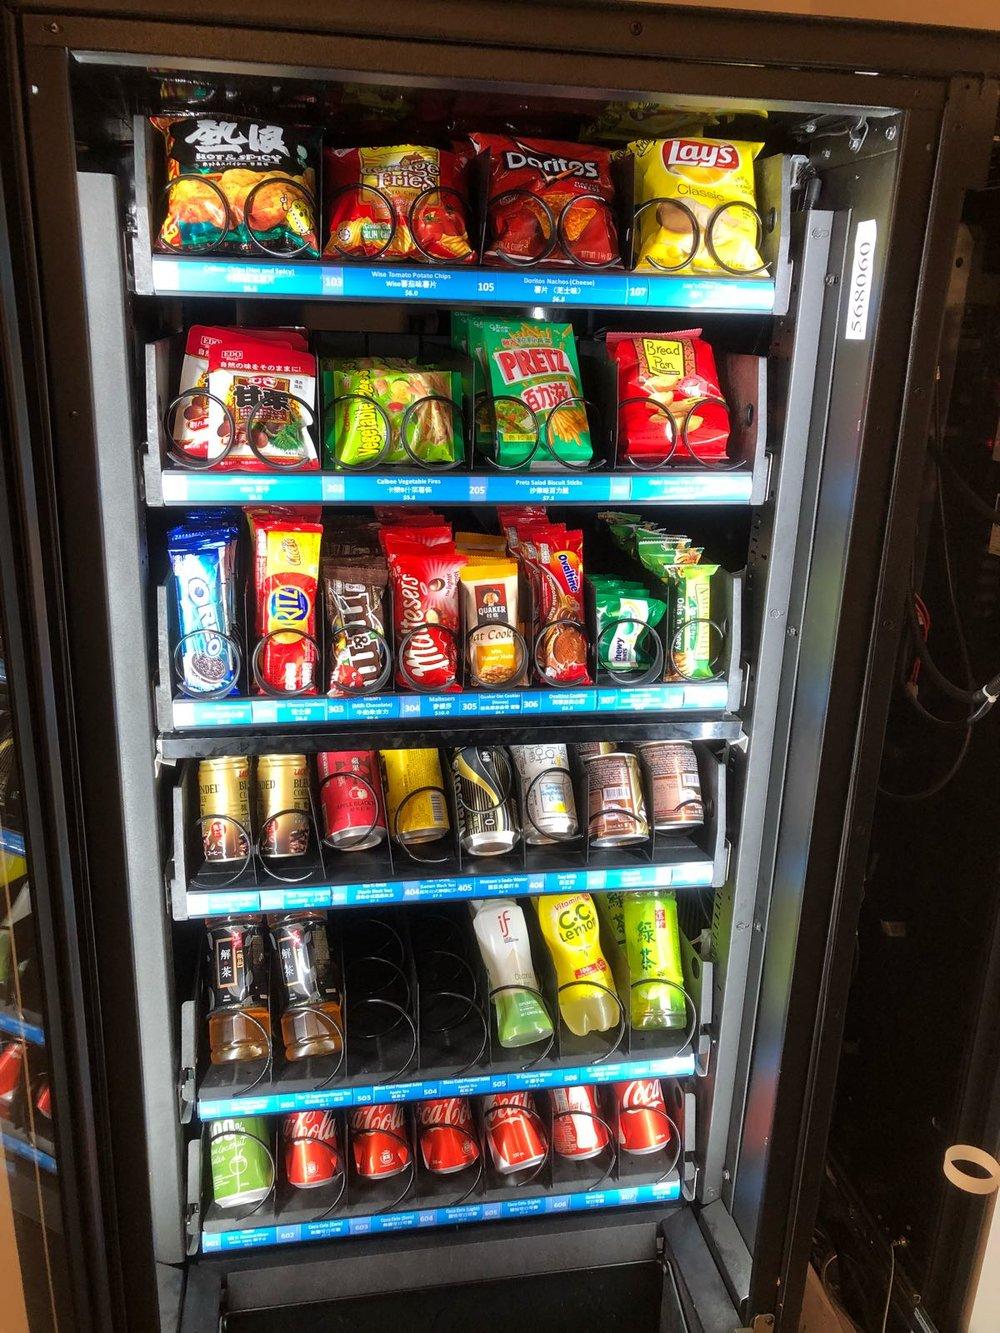 FreshUp,自動售賣機,自動販賣機,零食,飲品,方便,快捷,智能,企業,公司,信任,卡爾文·克雷恩